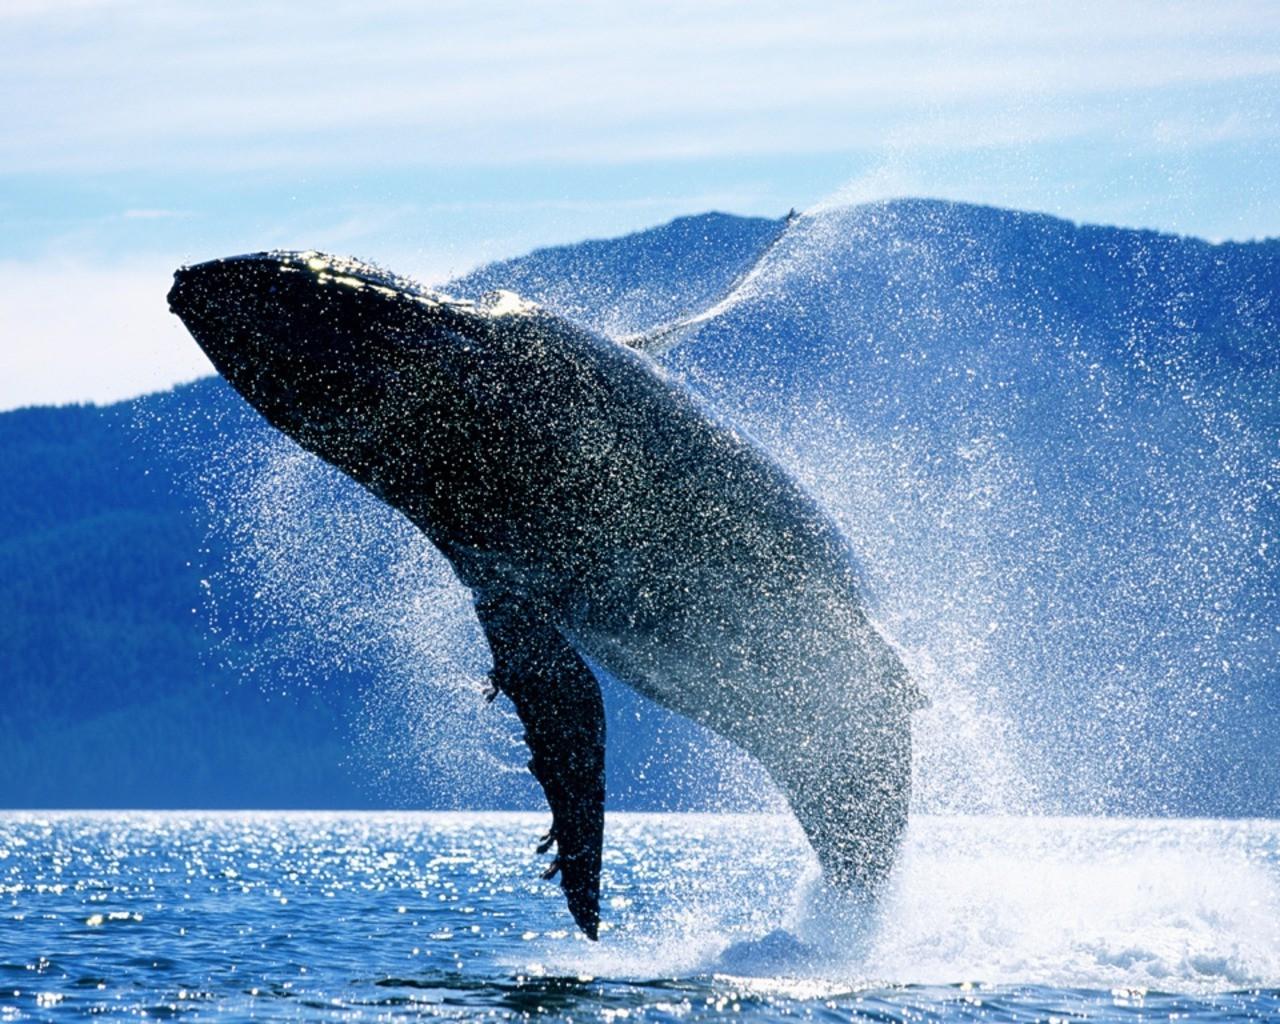 hintergrundbilder meer wal arktis buckelwal biologie s ugetier 1280x1024 px wirbeltier. Black Bedroom Furniture Sets. Home Design Ideas